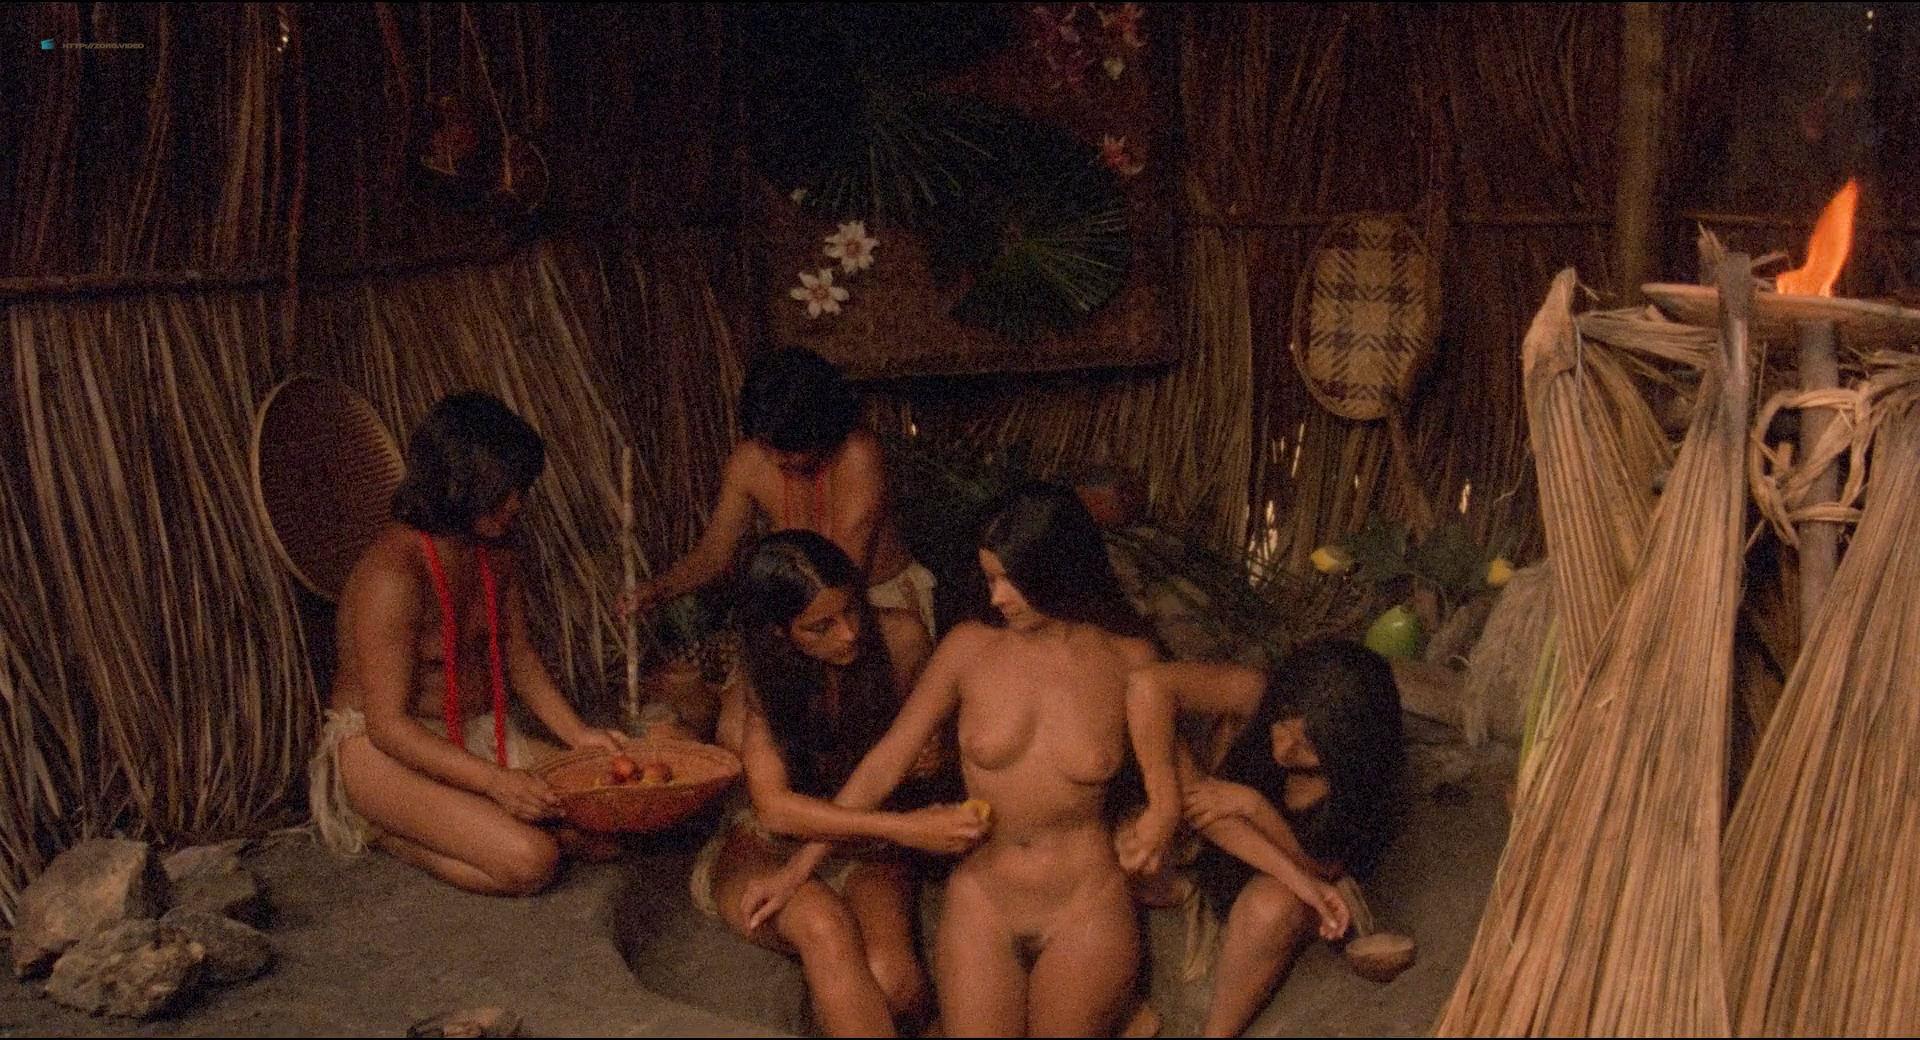 Elvire Audray nude Sara Fleszer, Jessica Bridges all nude full frontal - White Slave (IT-1985) HD 1080p BluRay (5)